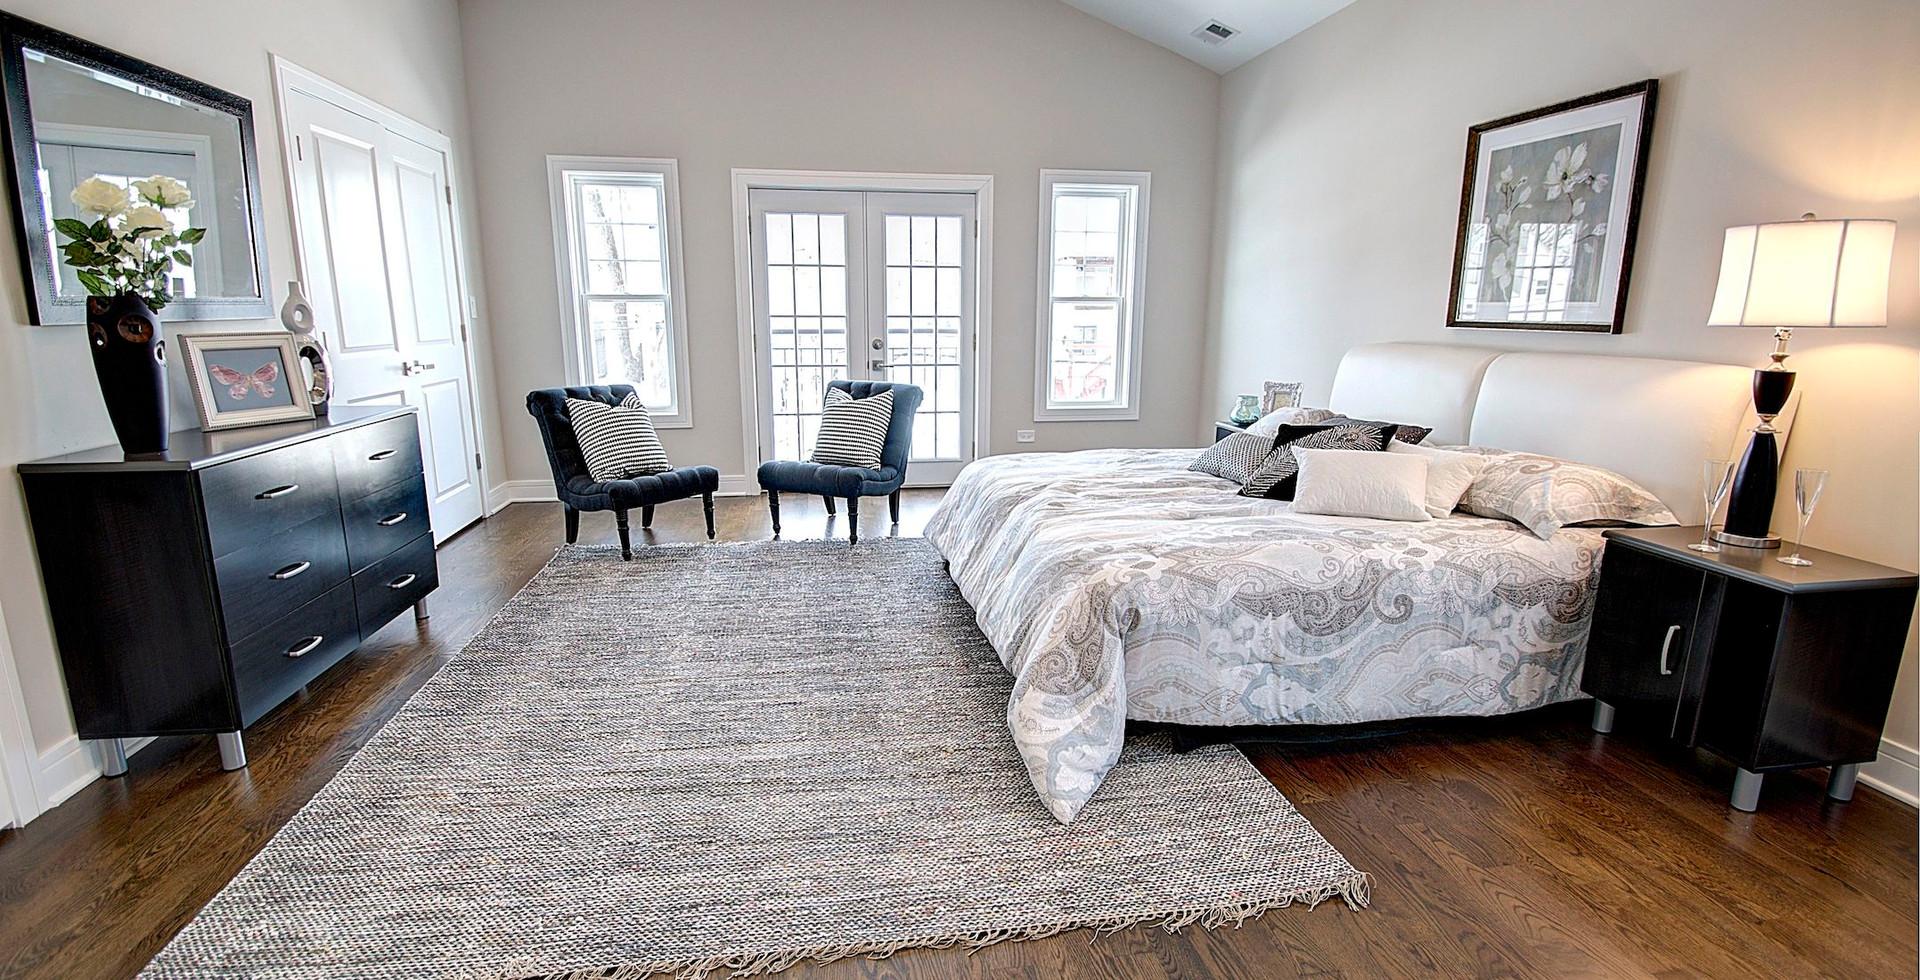 Bedroom in Arlington Heights designed by MRM Home Design.jpg